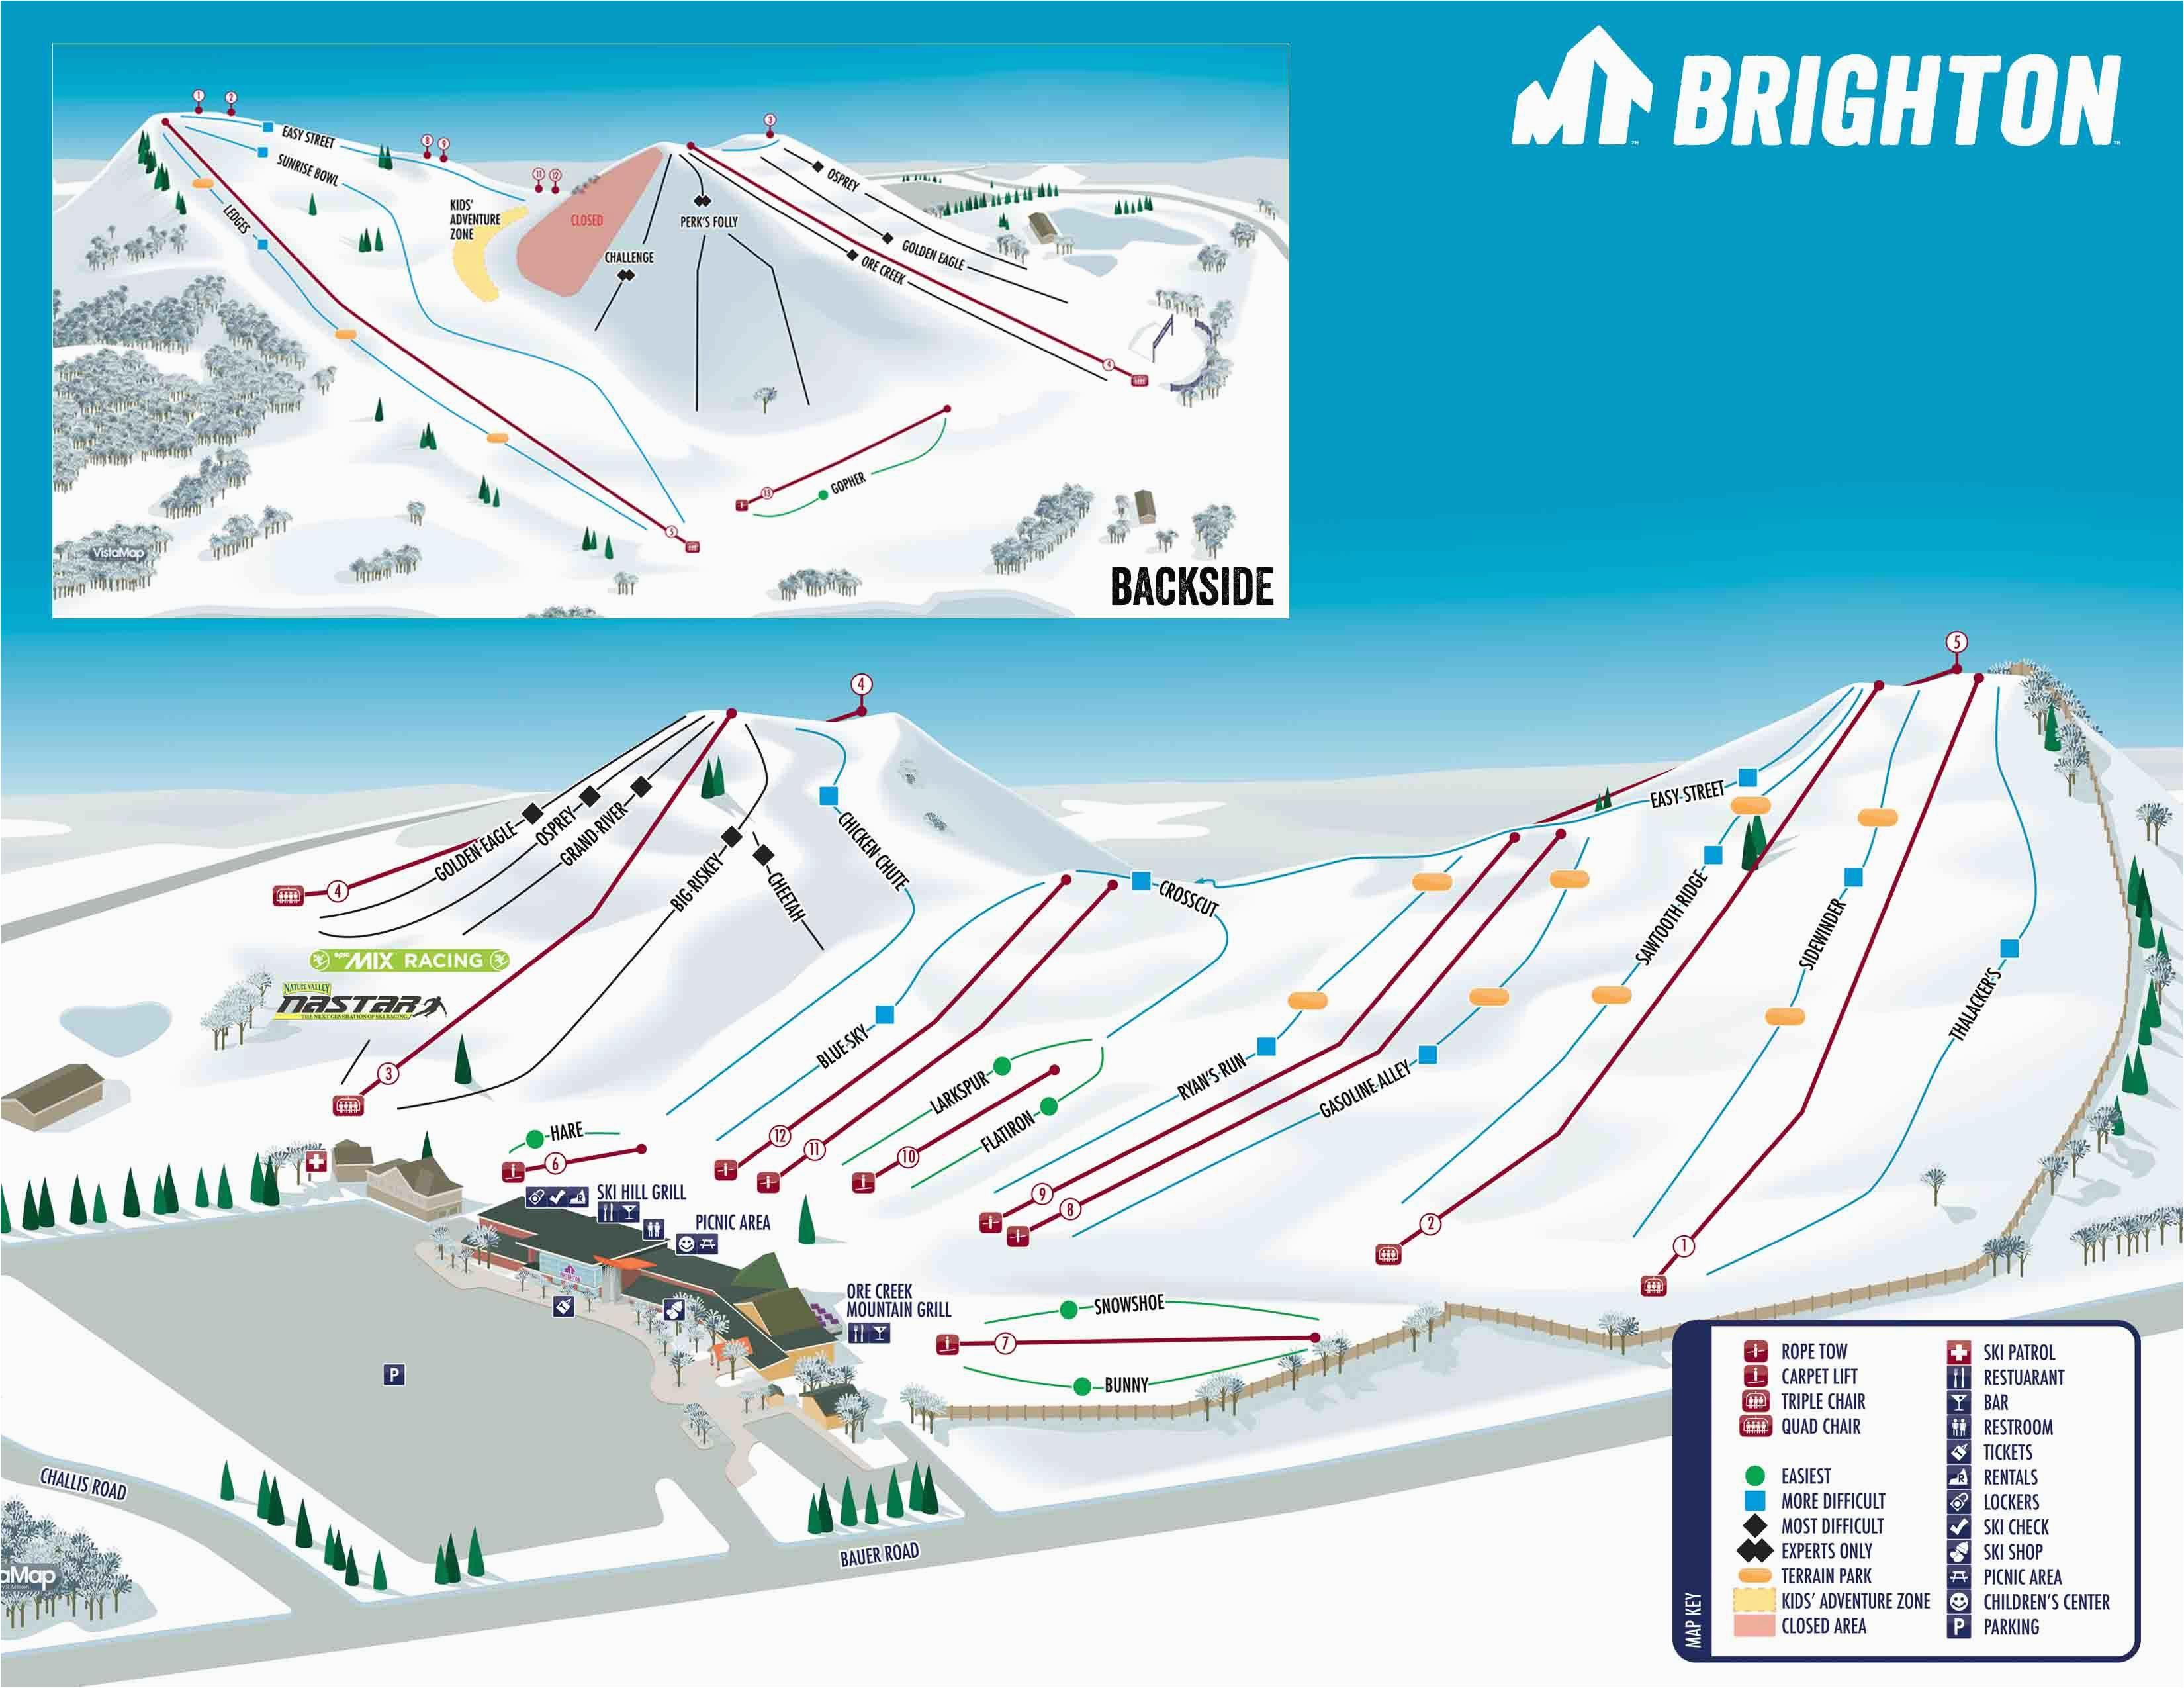 mt brighton trail map onthesnow